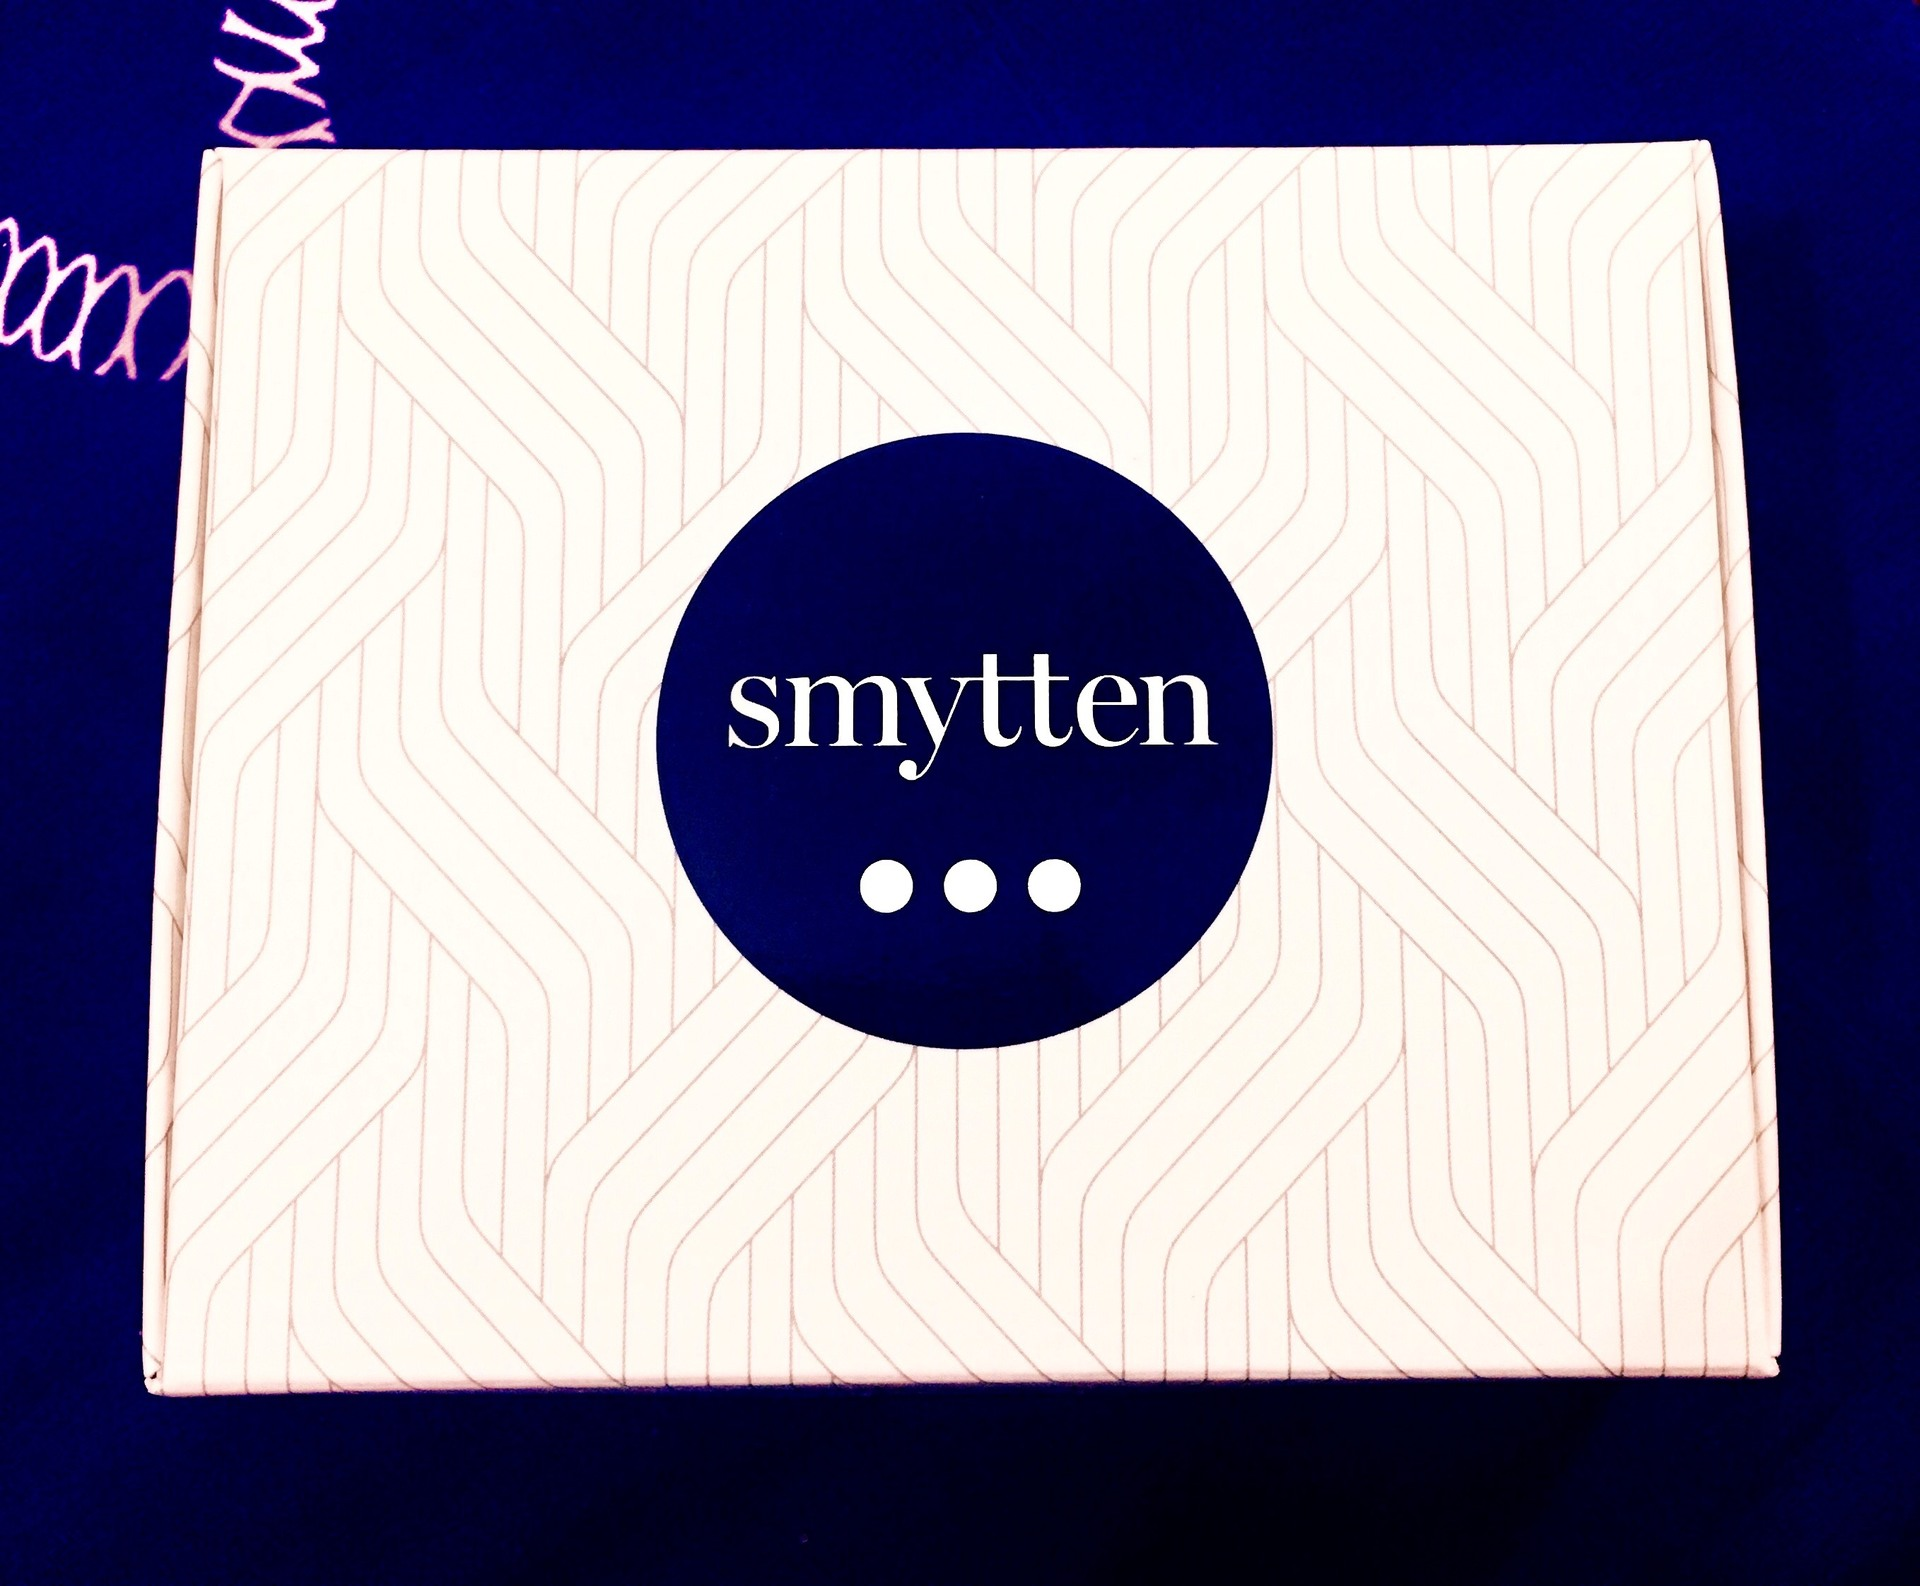 STAY SMYTTEN  image